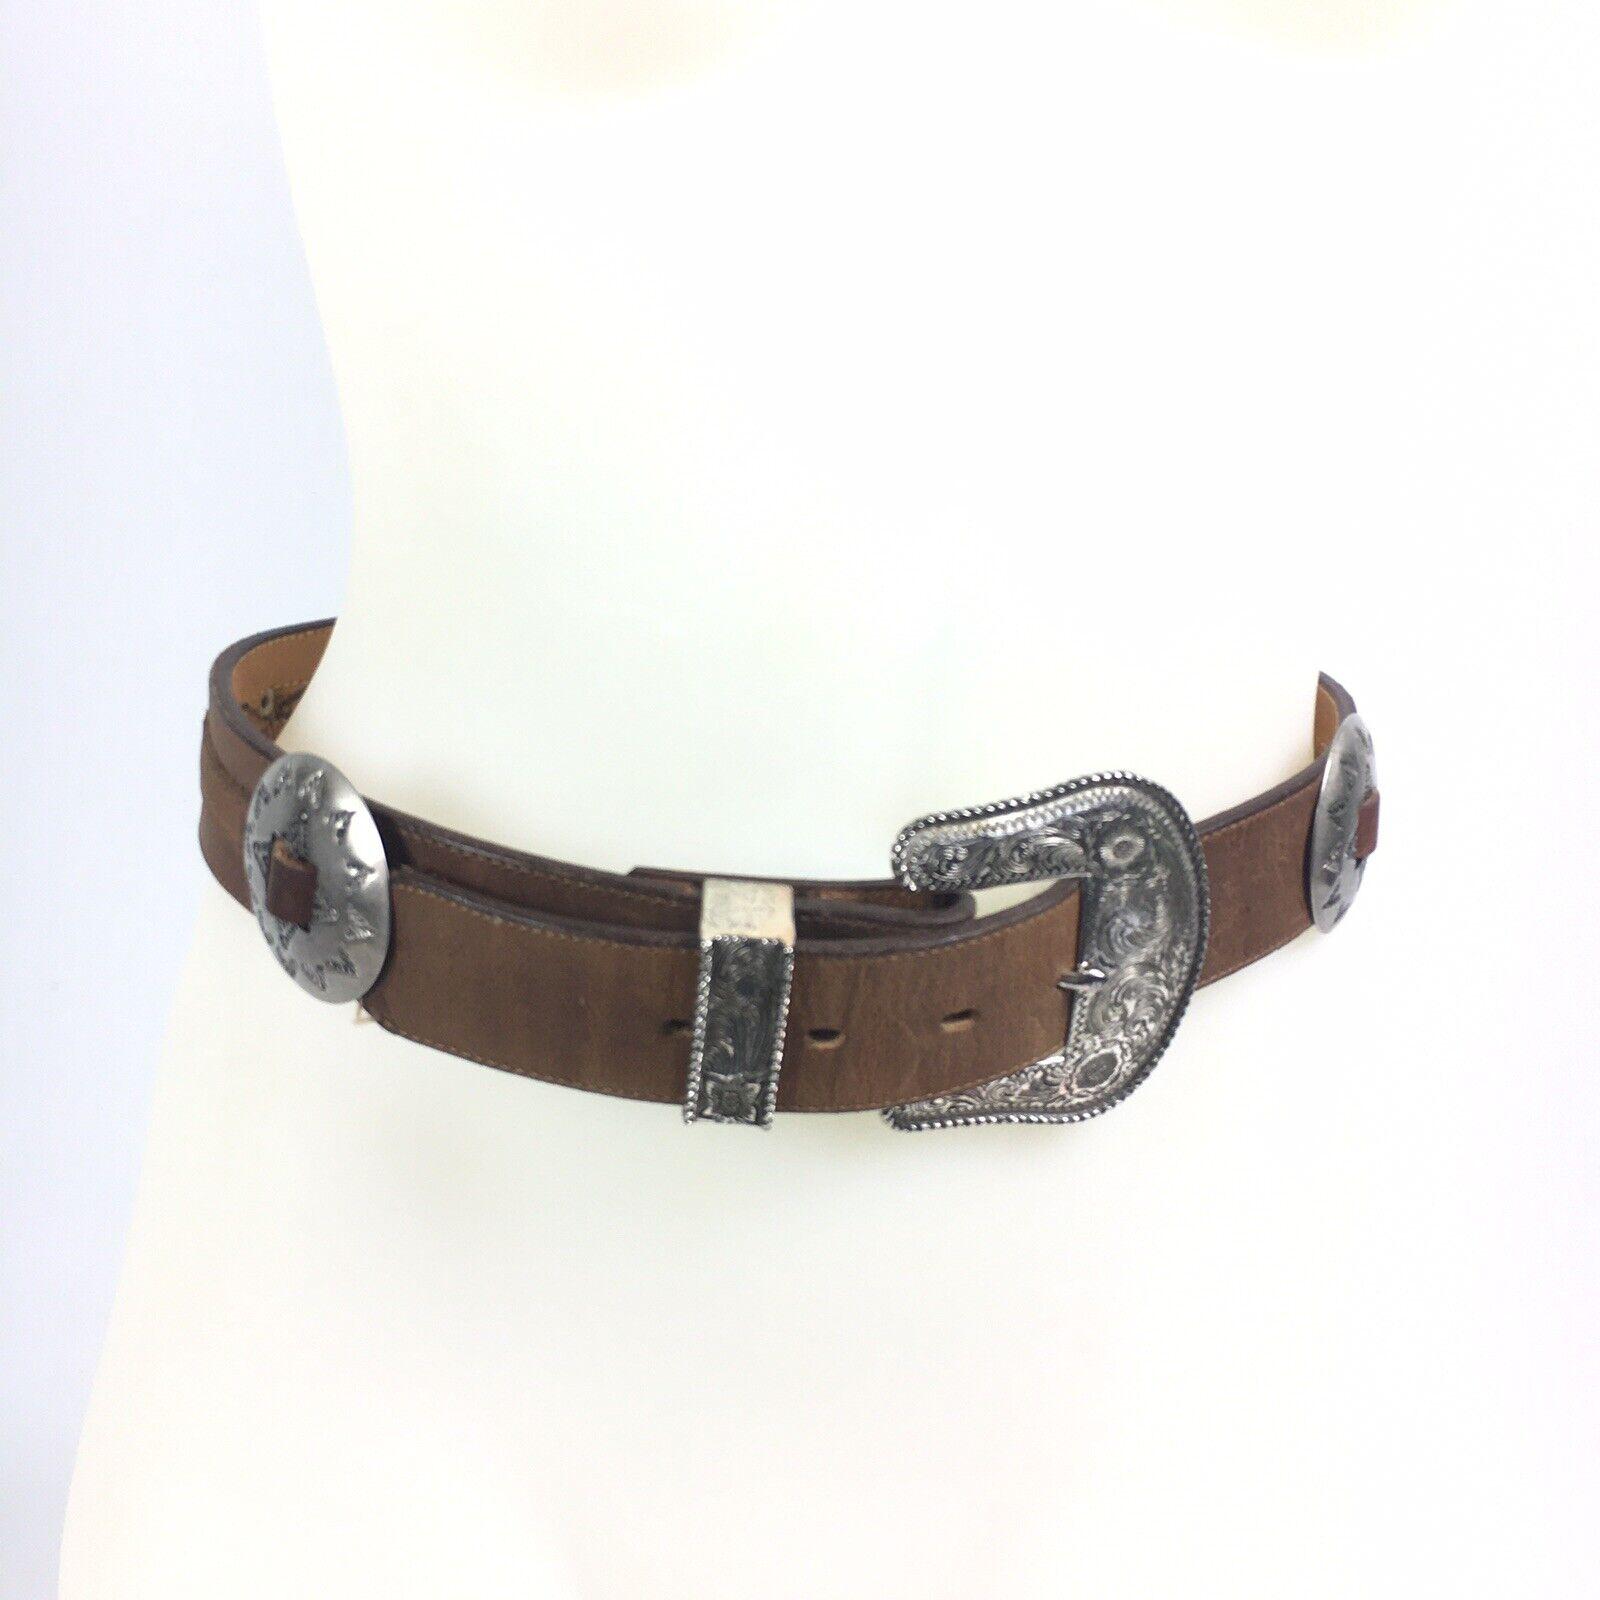 Cimarron Belt Co. Brown Leather Conchos Medallion Belt Size 28 Womens USA Boho